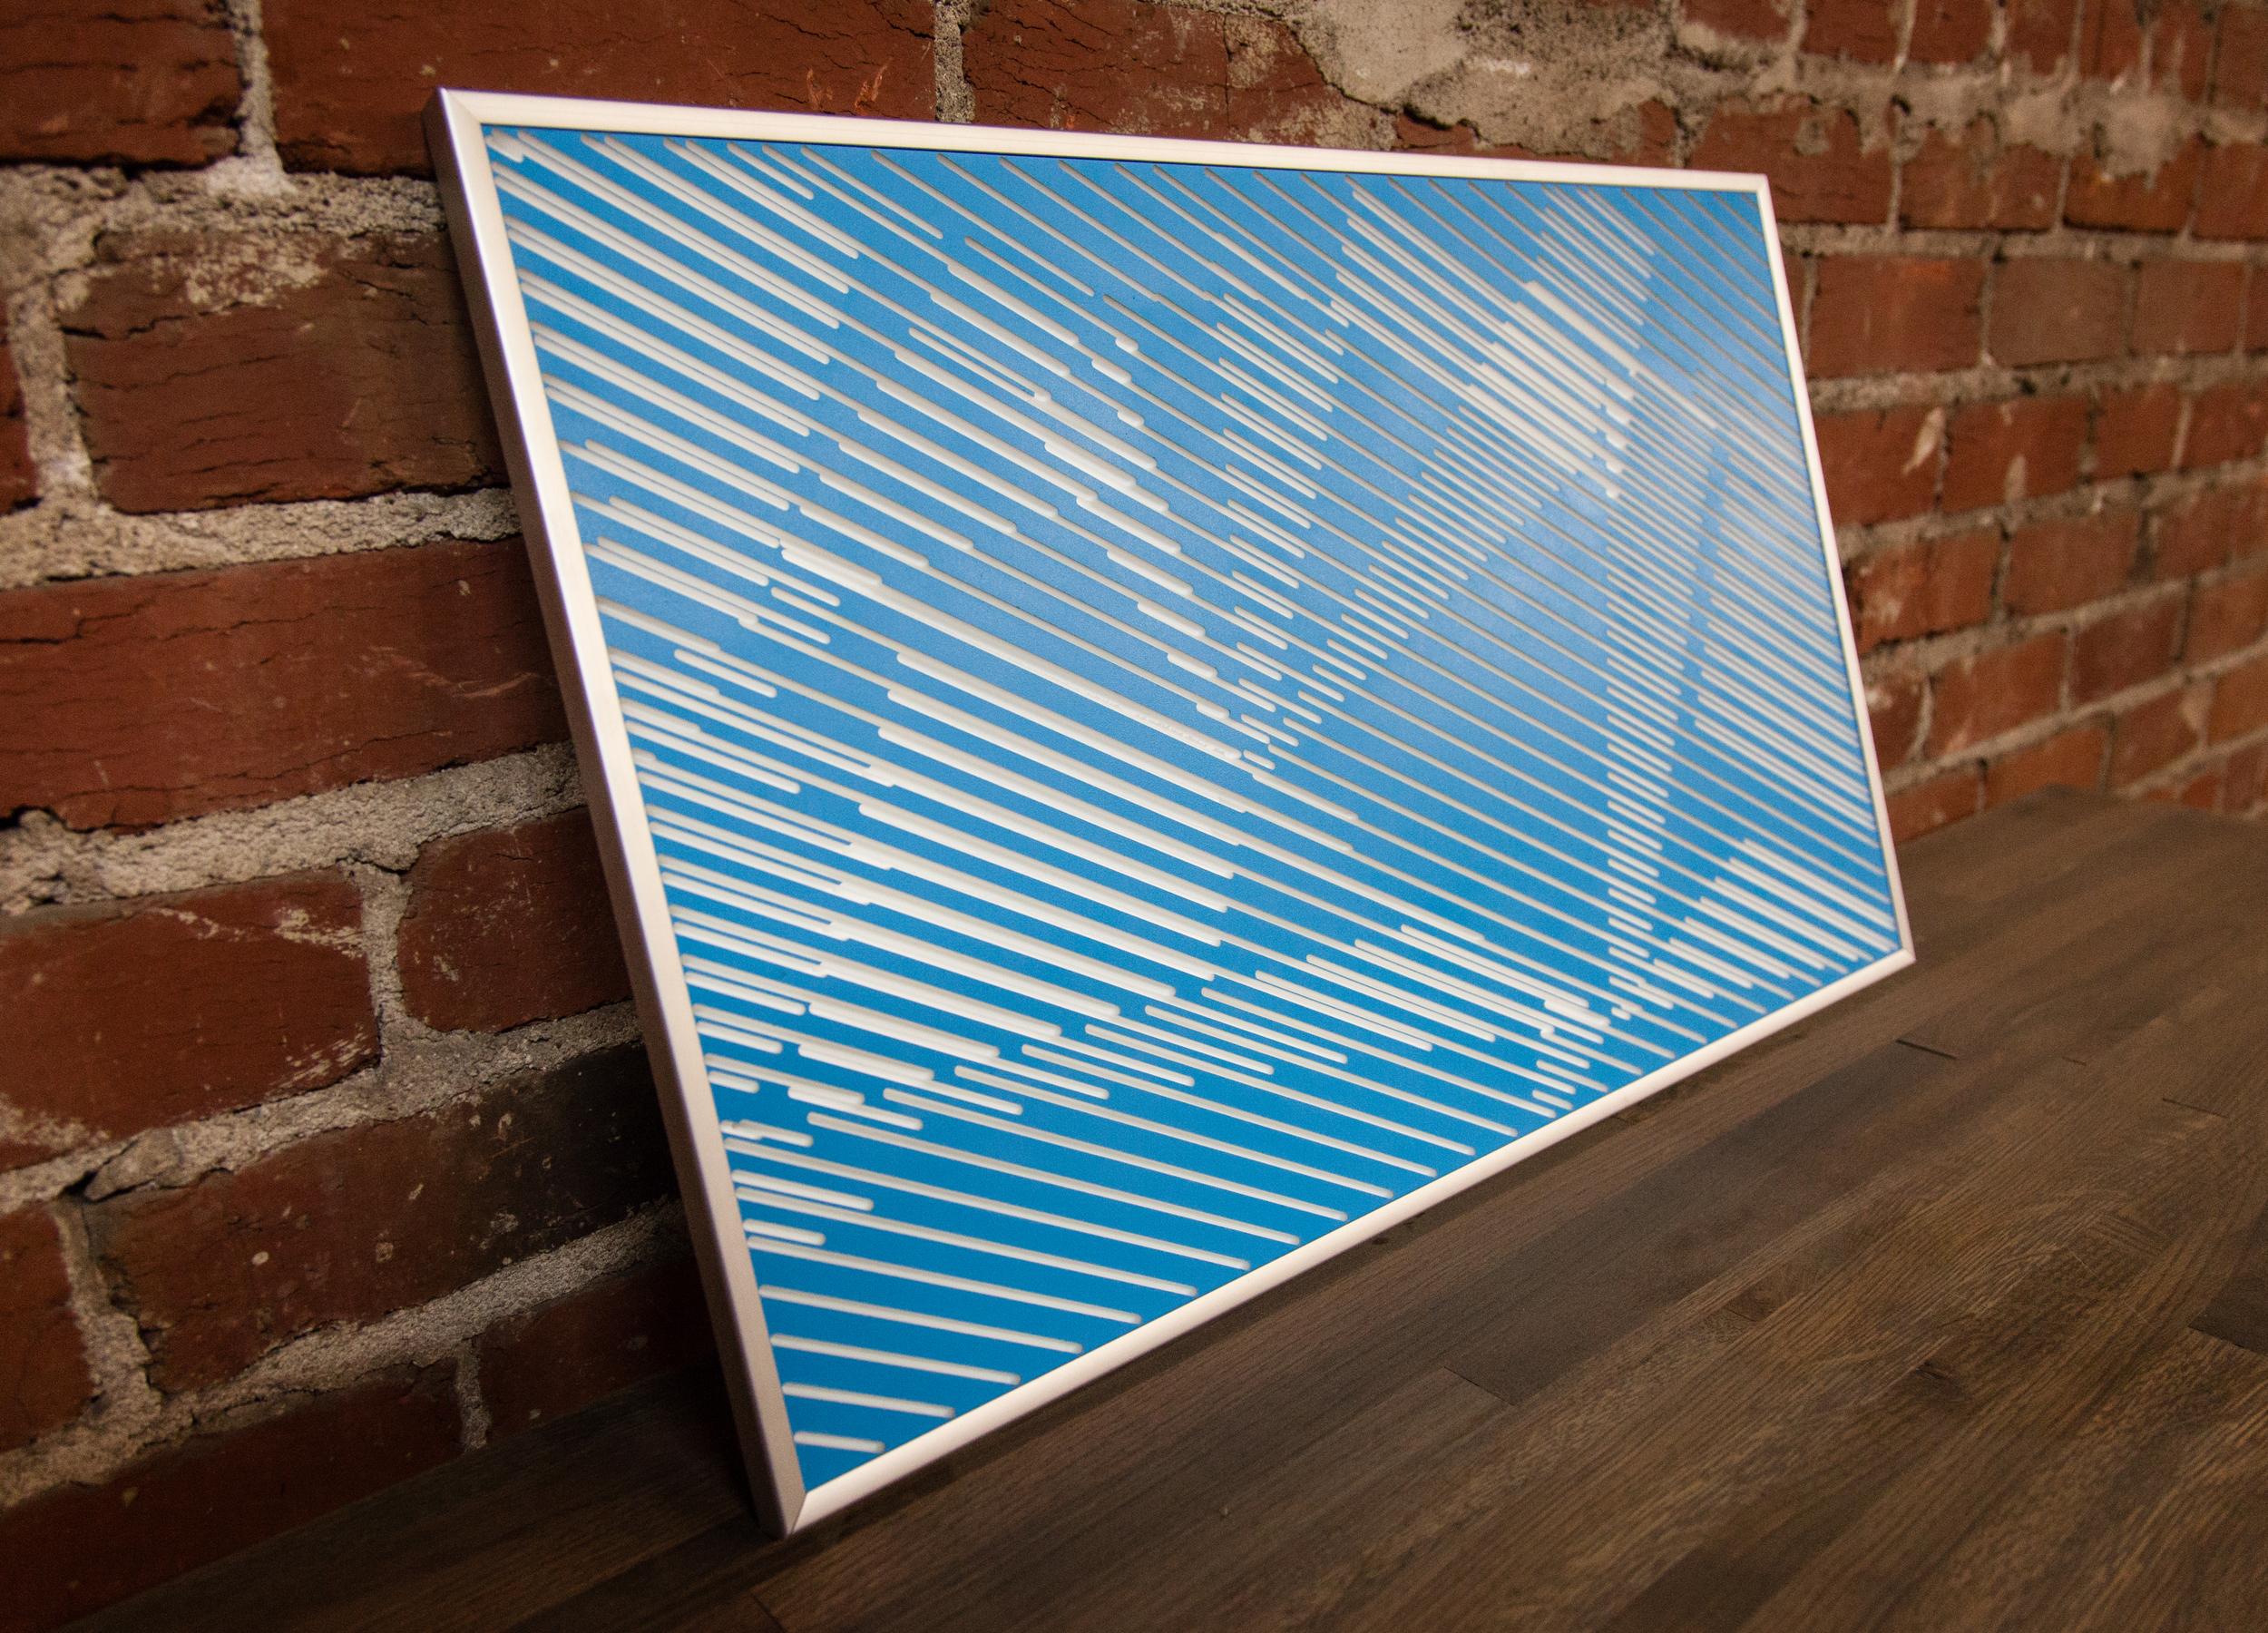 asteriskos-design-fabrication-cnc-art-solid-surface-graphic-pattern- side